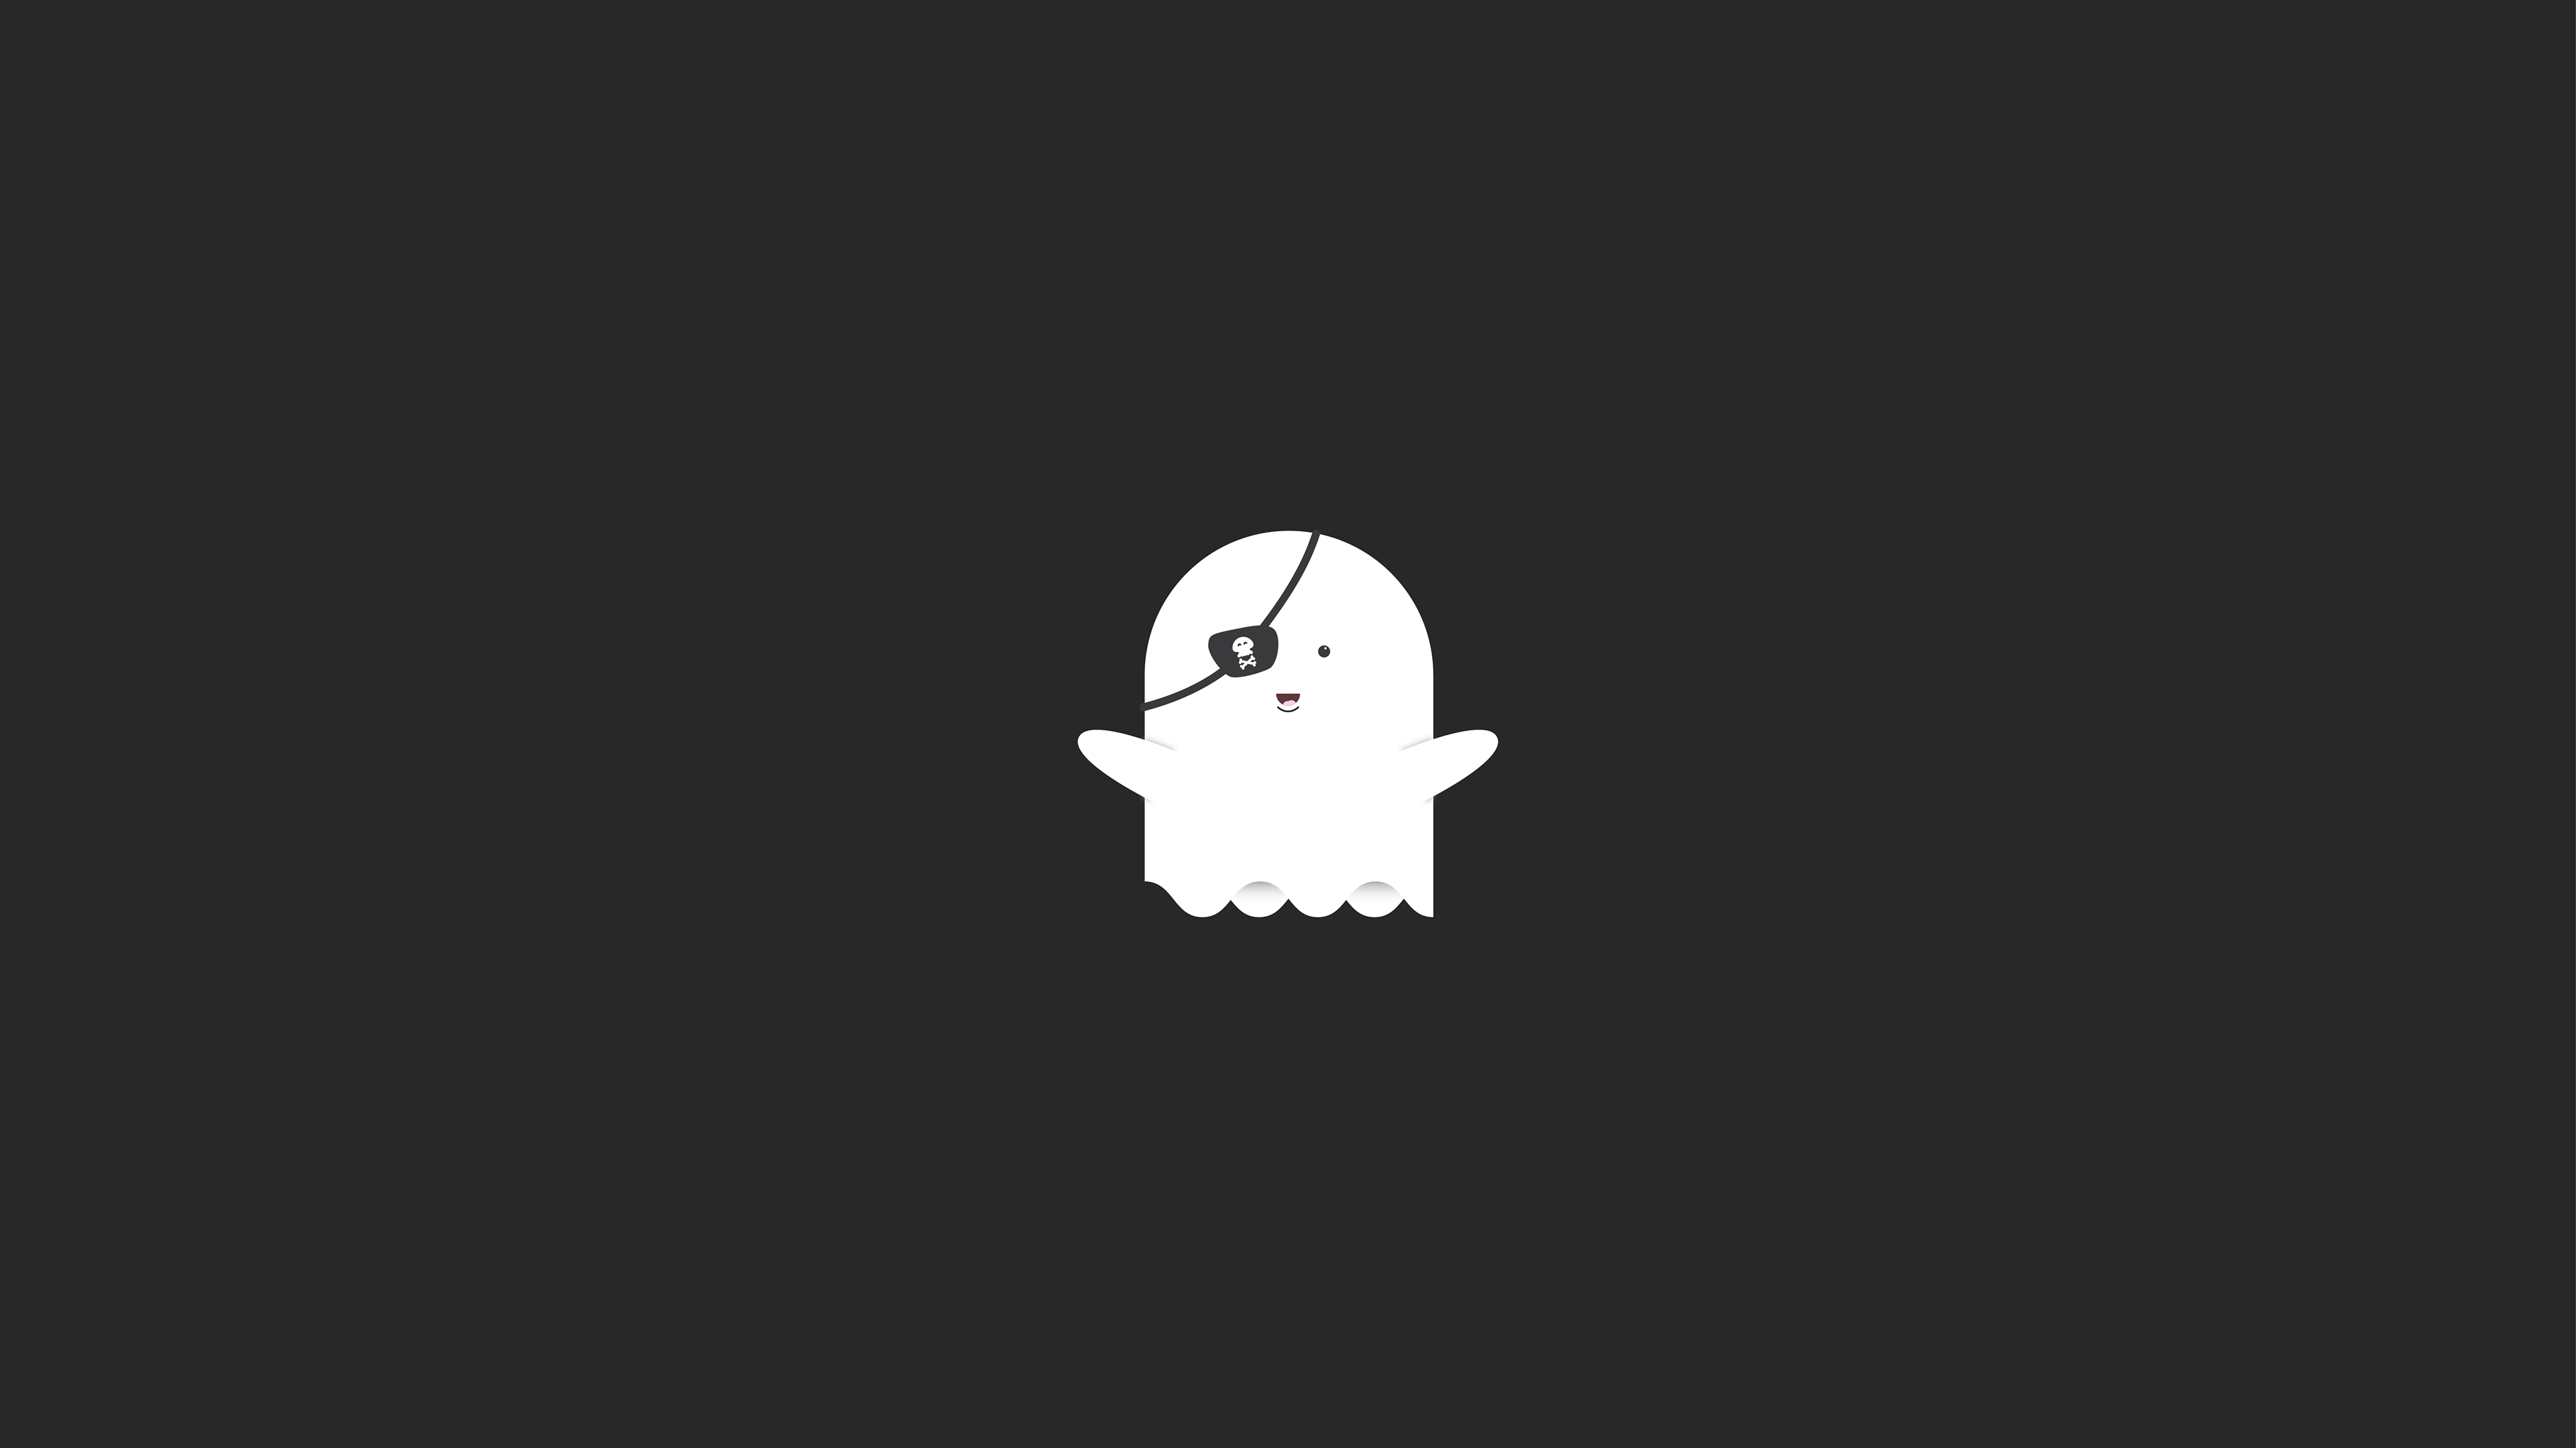 Funny Pirate Ghost Minimalist, HD Artist, 4k Wallpapers ...